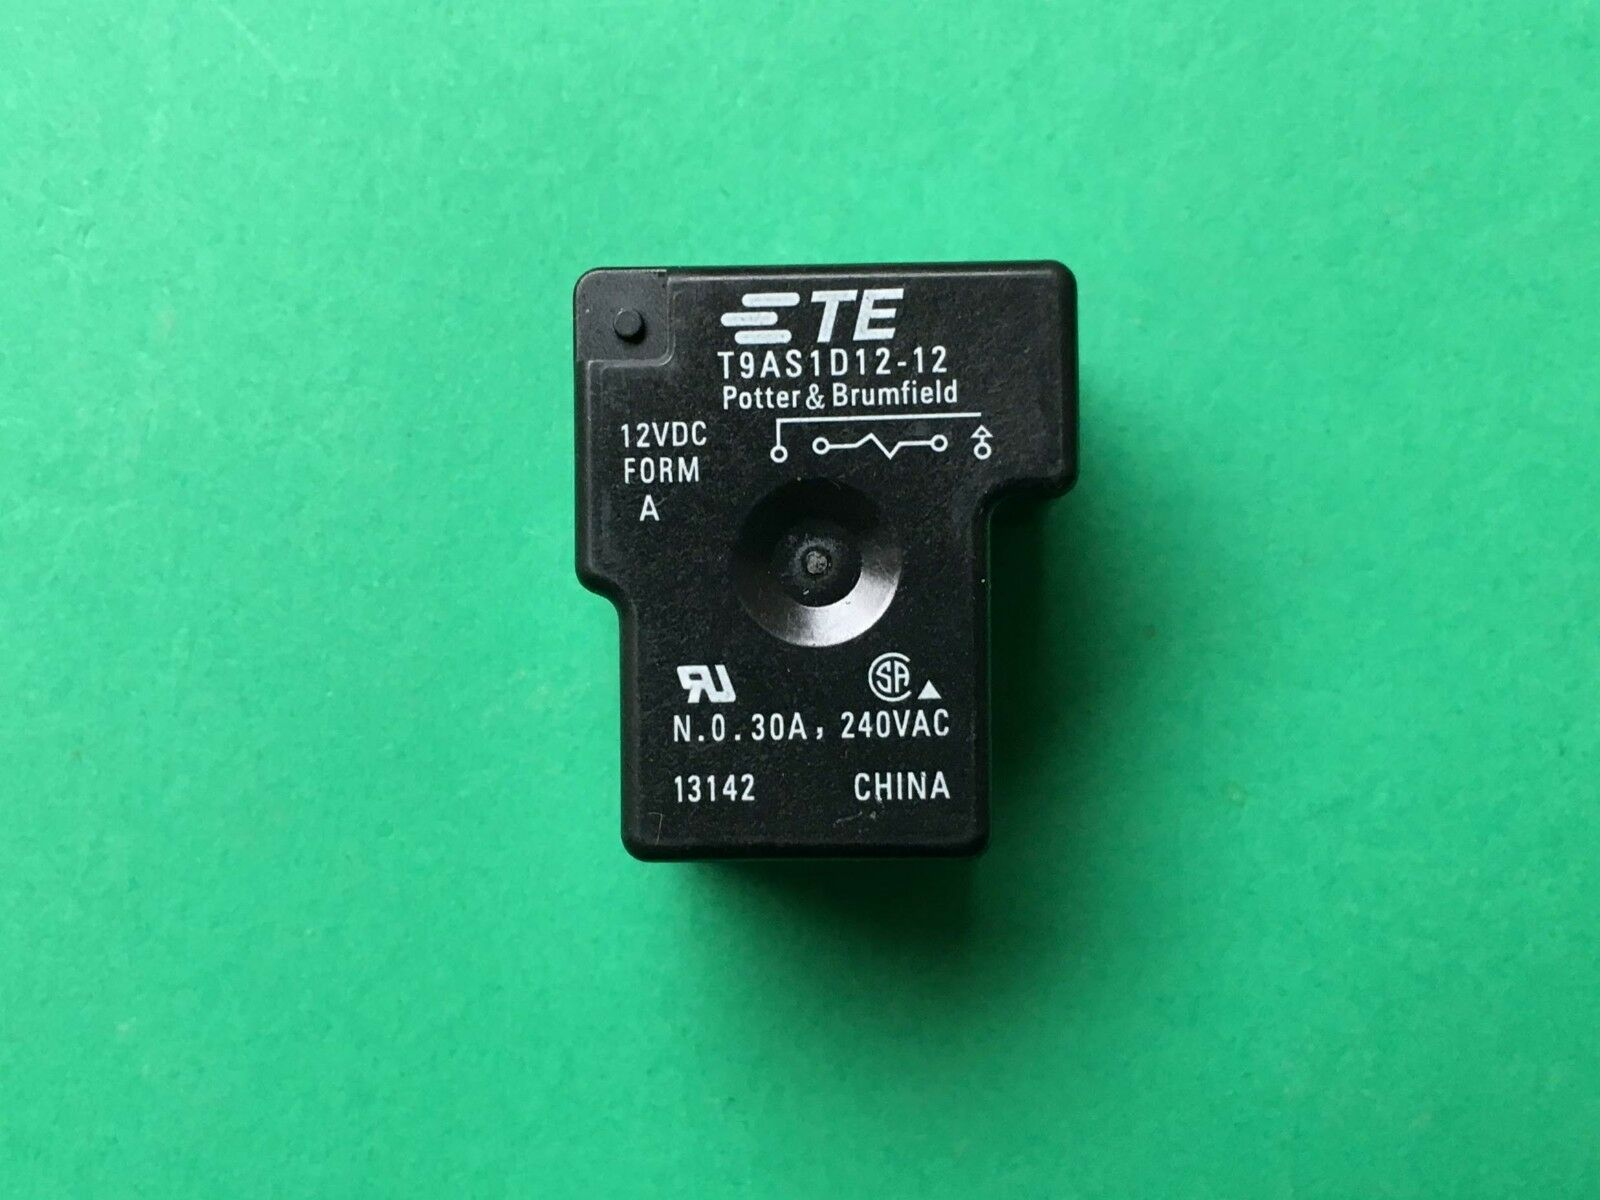 electromagnetic; SPST-NO; Ucoil:12VDC; 45A... V23076-A3001-C132-1pcs Relay